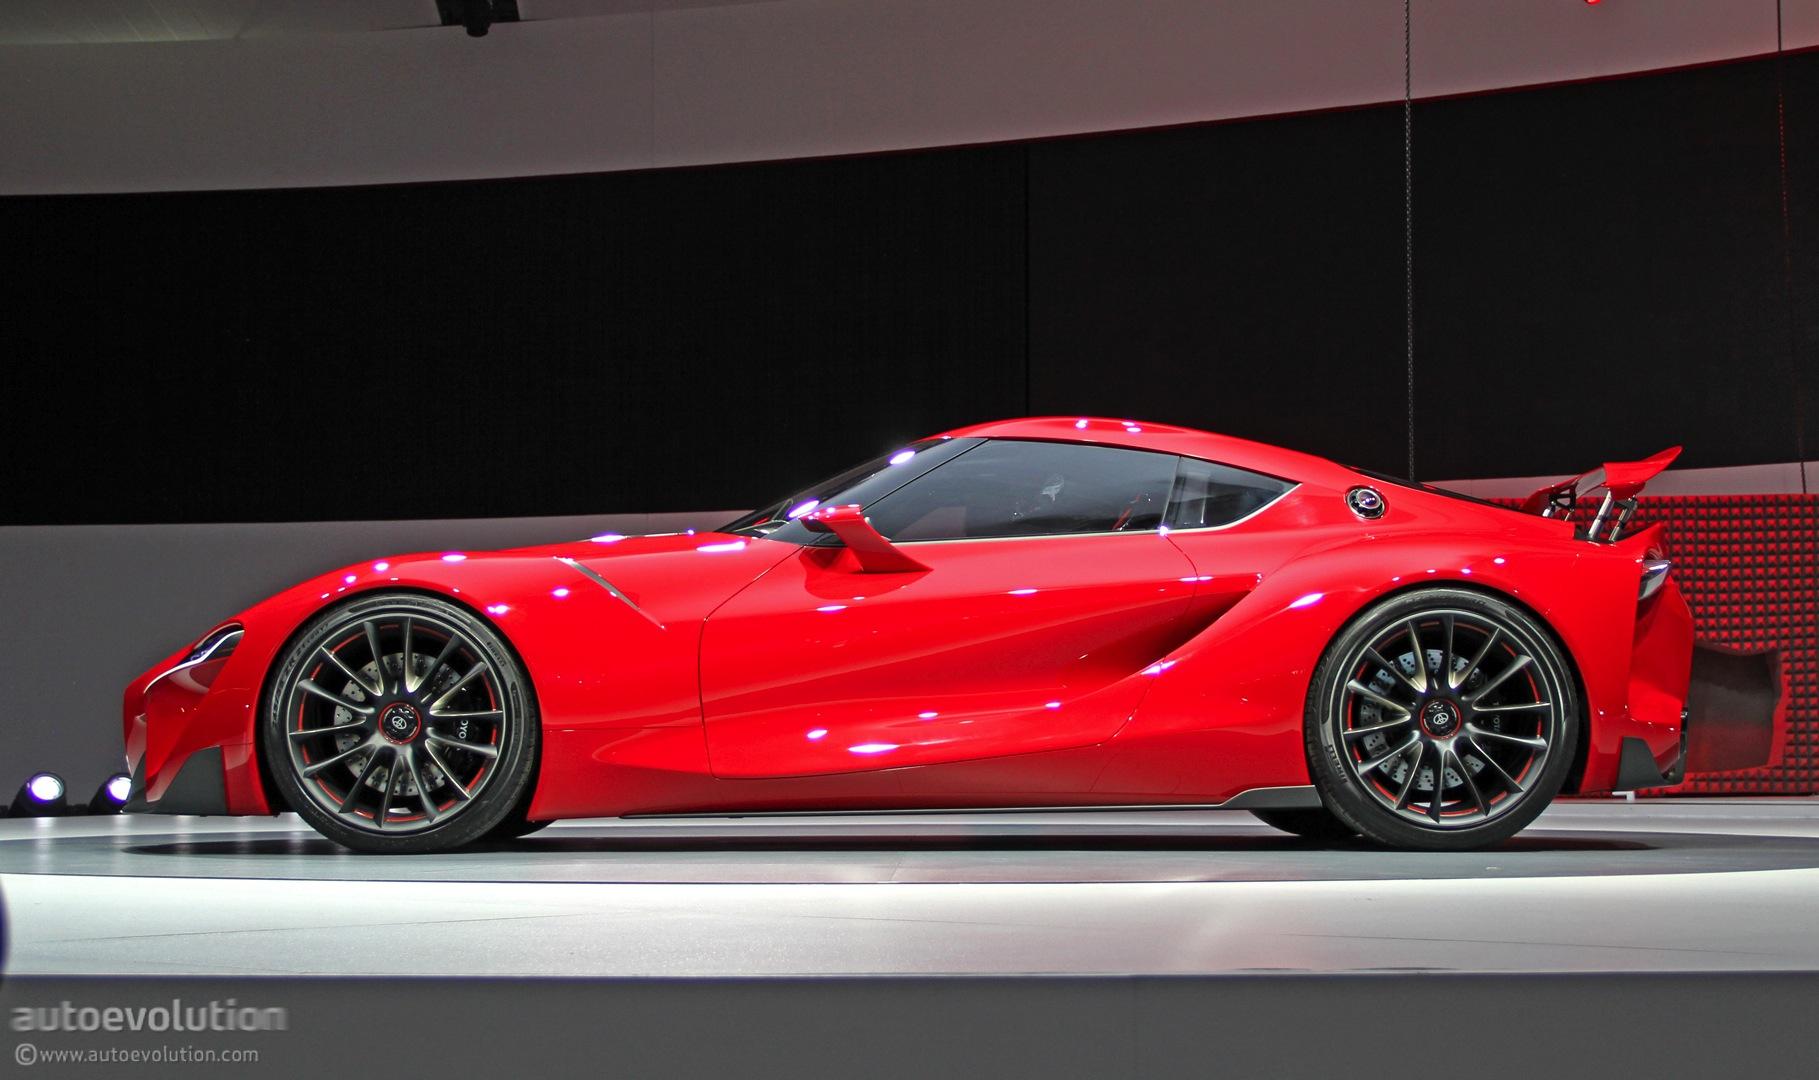 Toyota Ft 1 Concept 美しい世界のコンセプトカー 画像 Naver まとめ